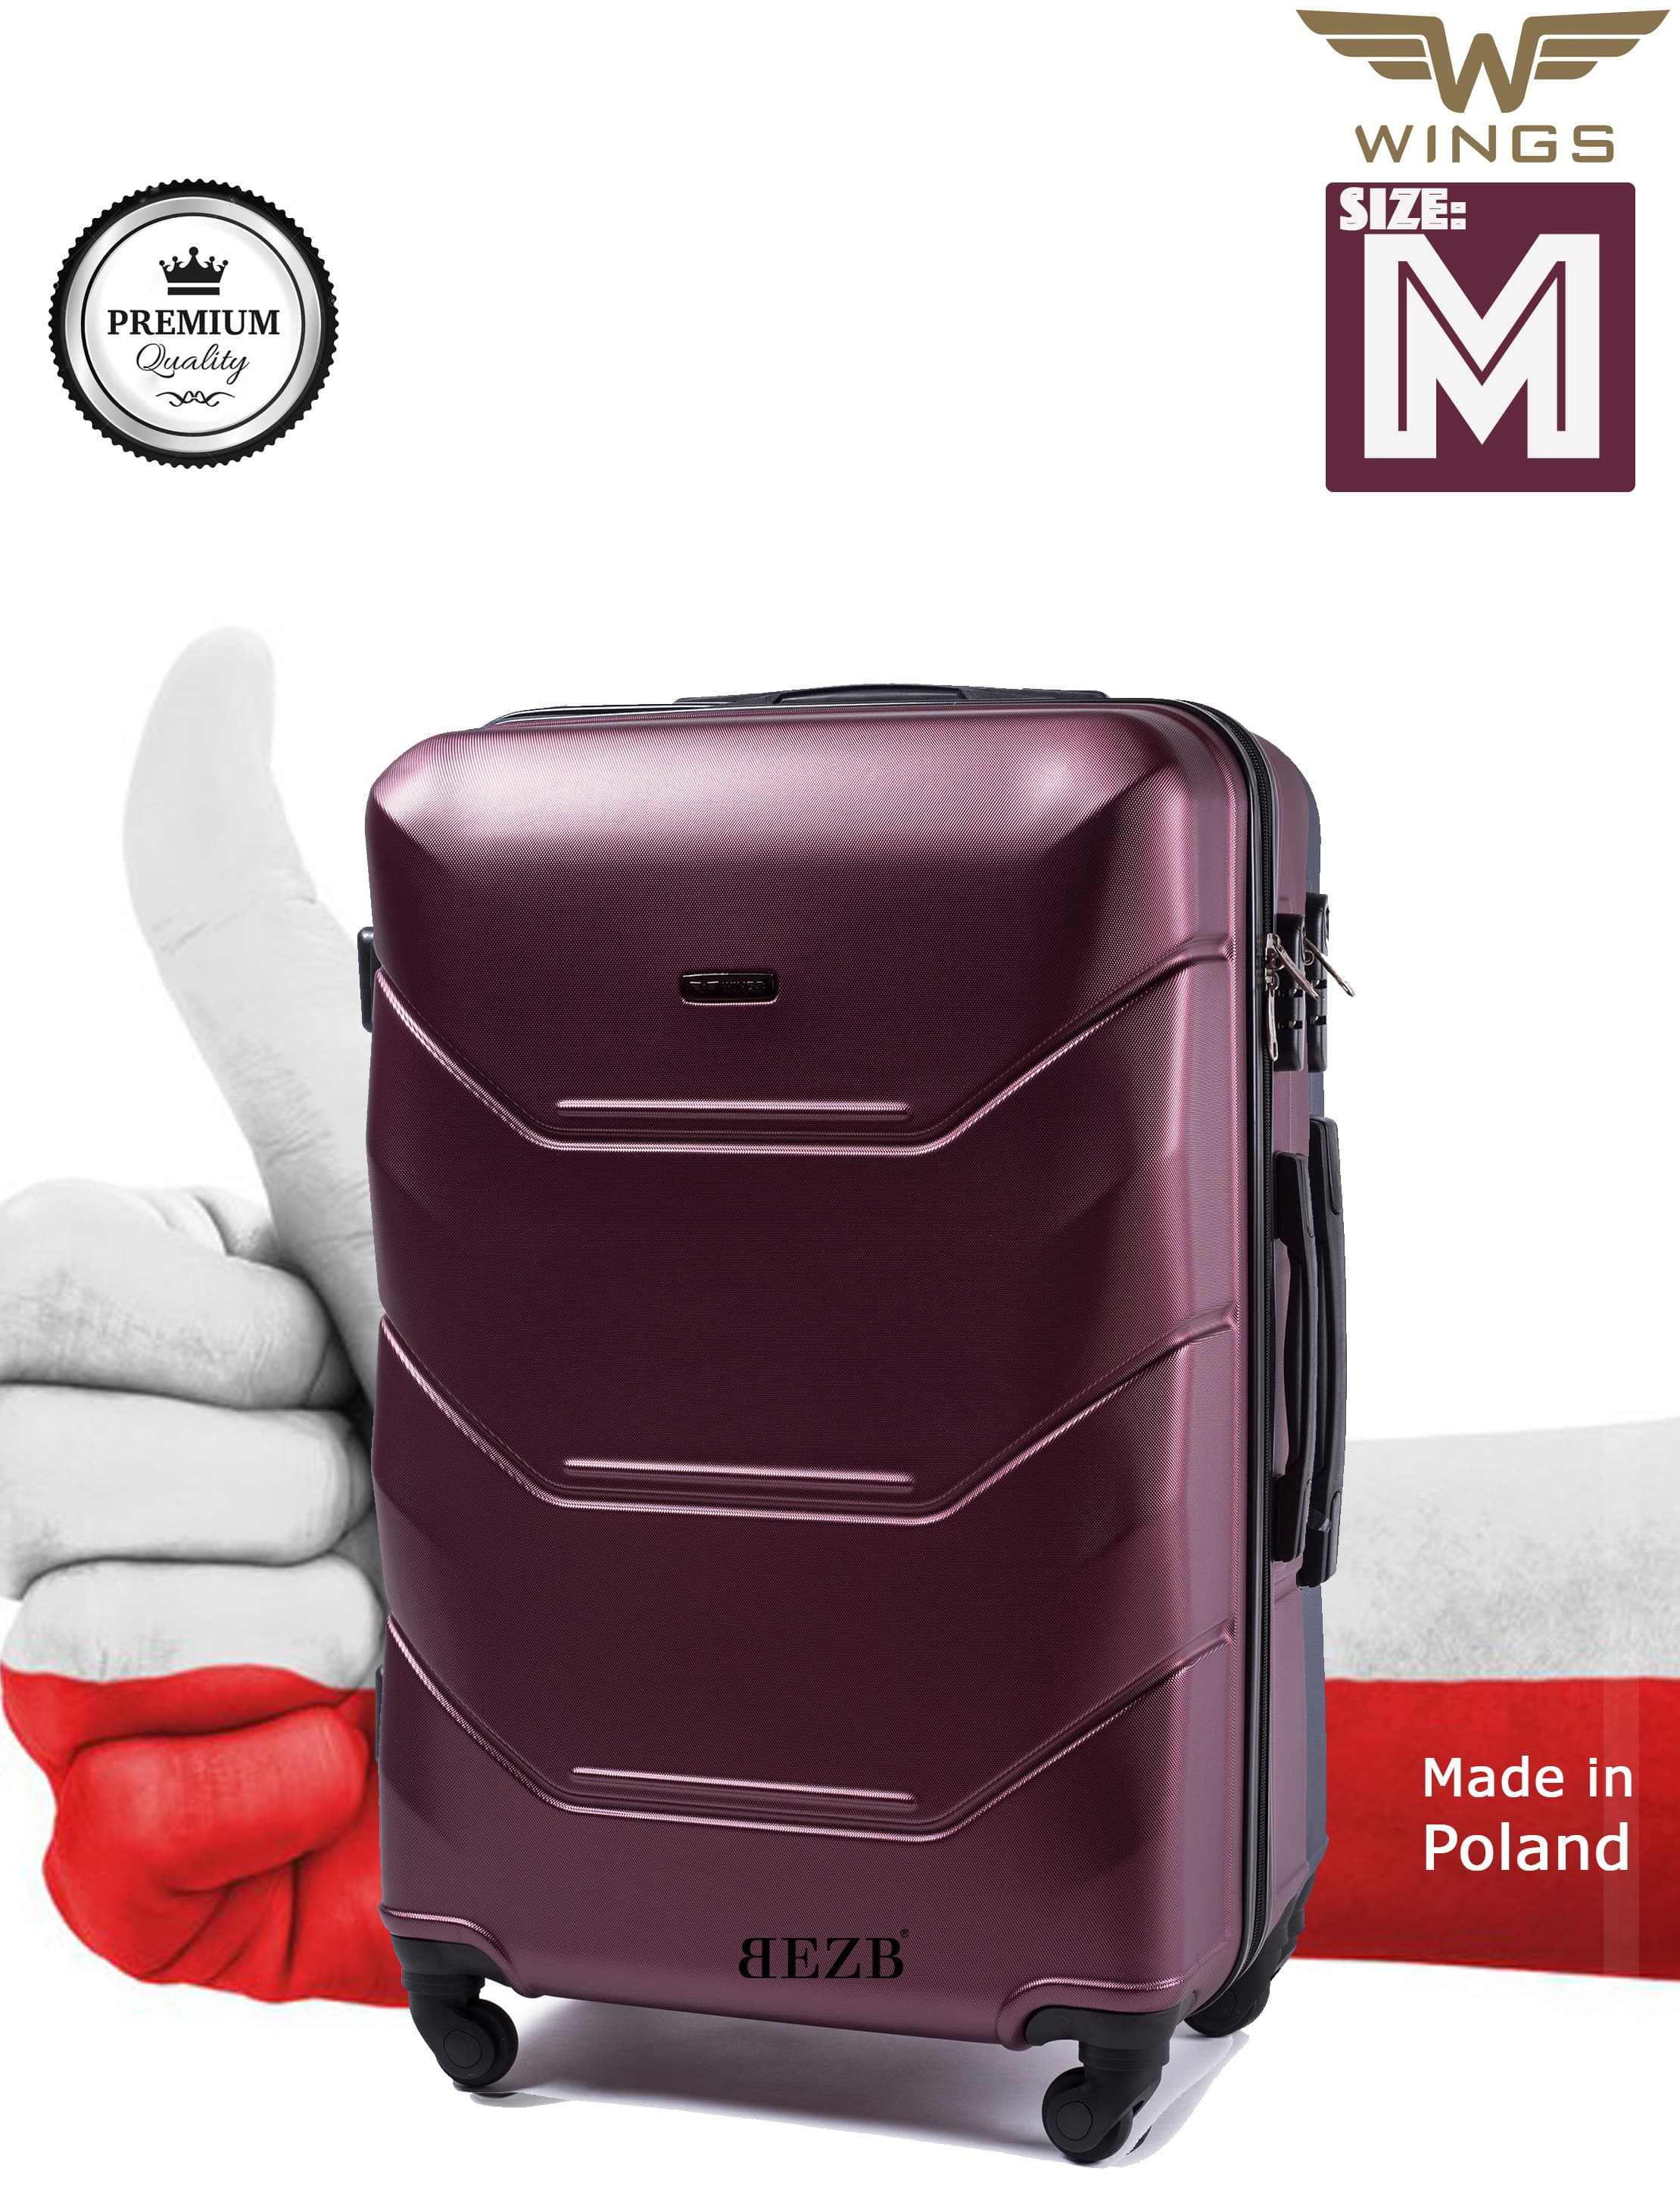 СРЕДНИЙ ЧЕМОДАН WINGS 147 M BURGUND PREMIUM НА 4-Х КАУЧУКОВЫХ КОЛЕСАХ!Для багажа ,до 18 кг